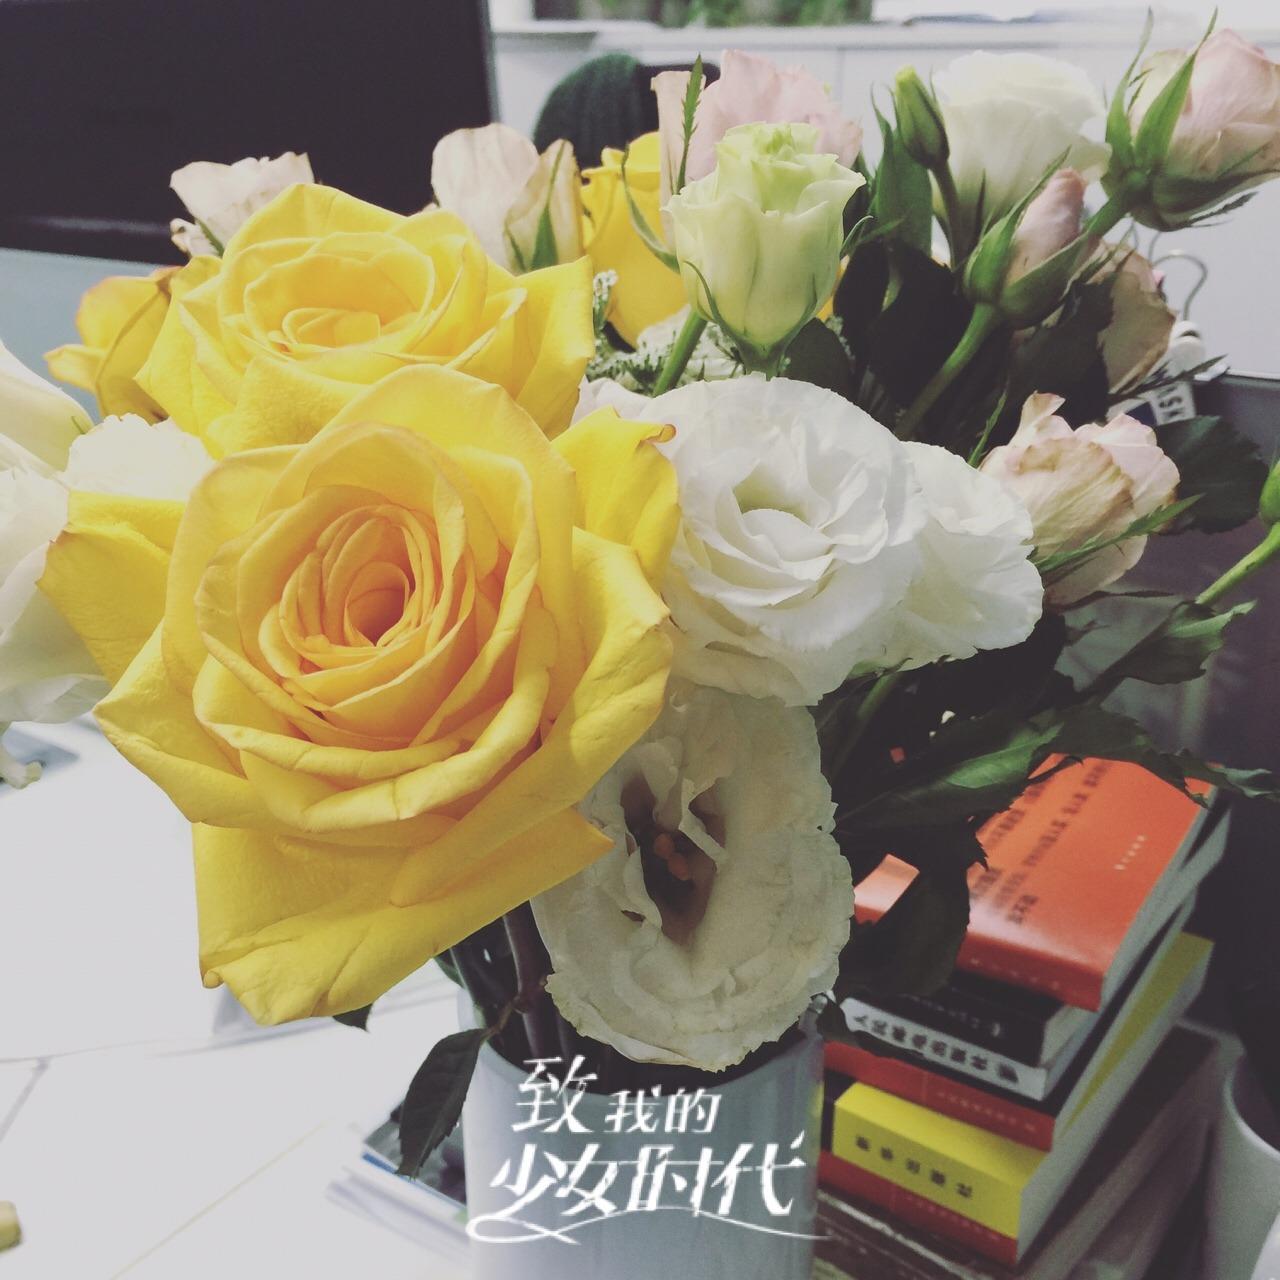 flowerplus鲜花_怎么样_flowerplus 的鲜花周送服务_-小红书